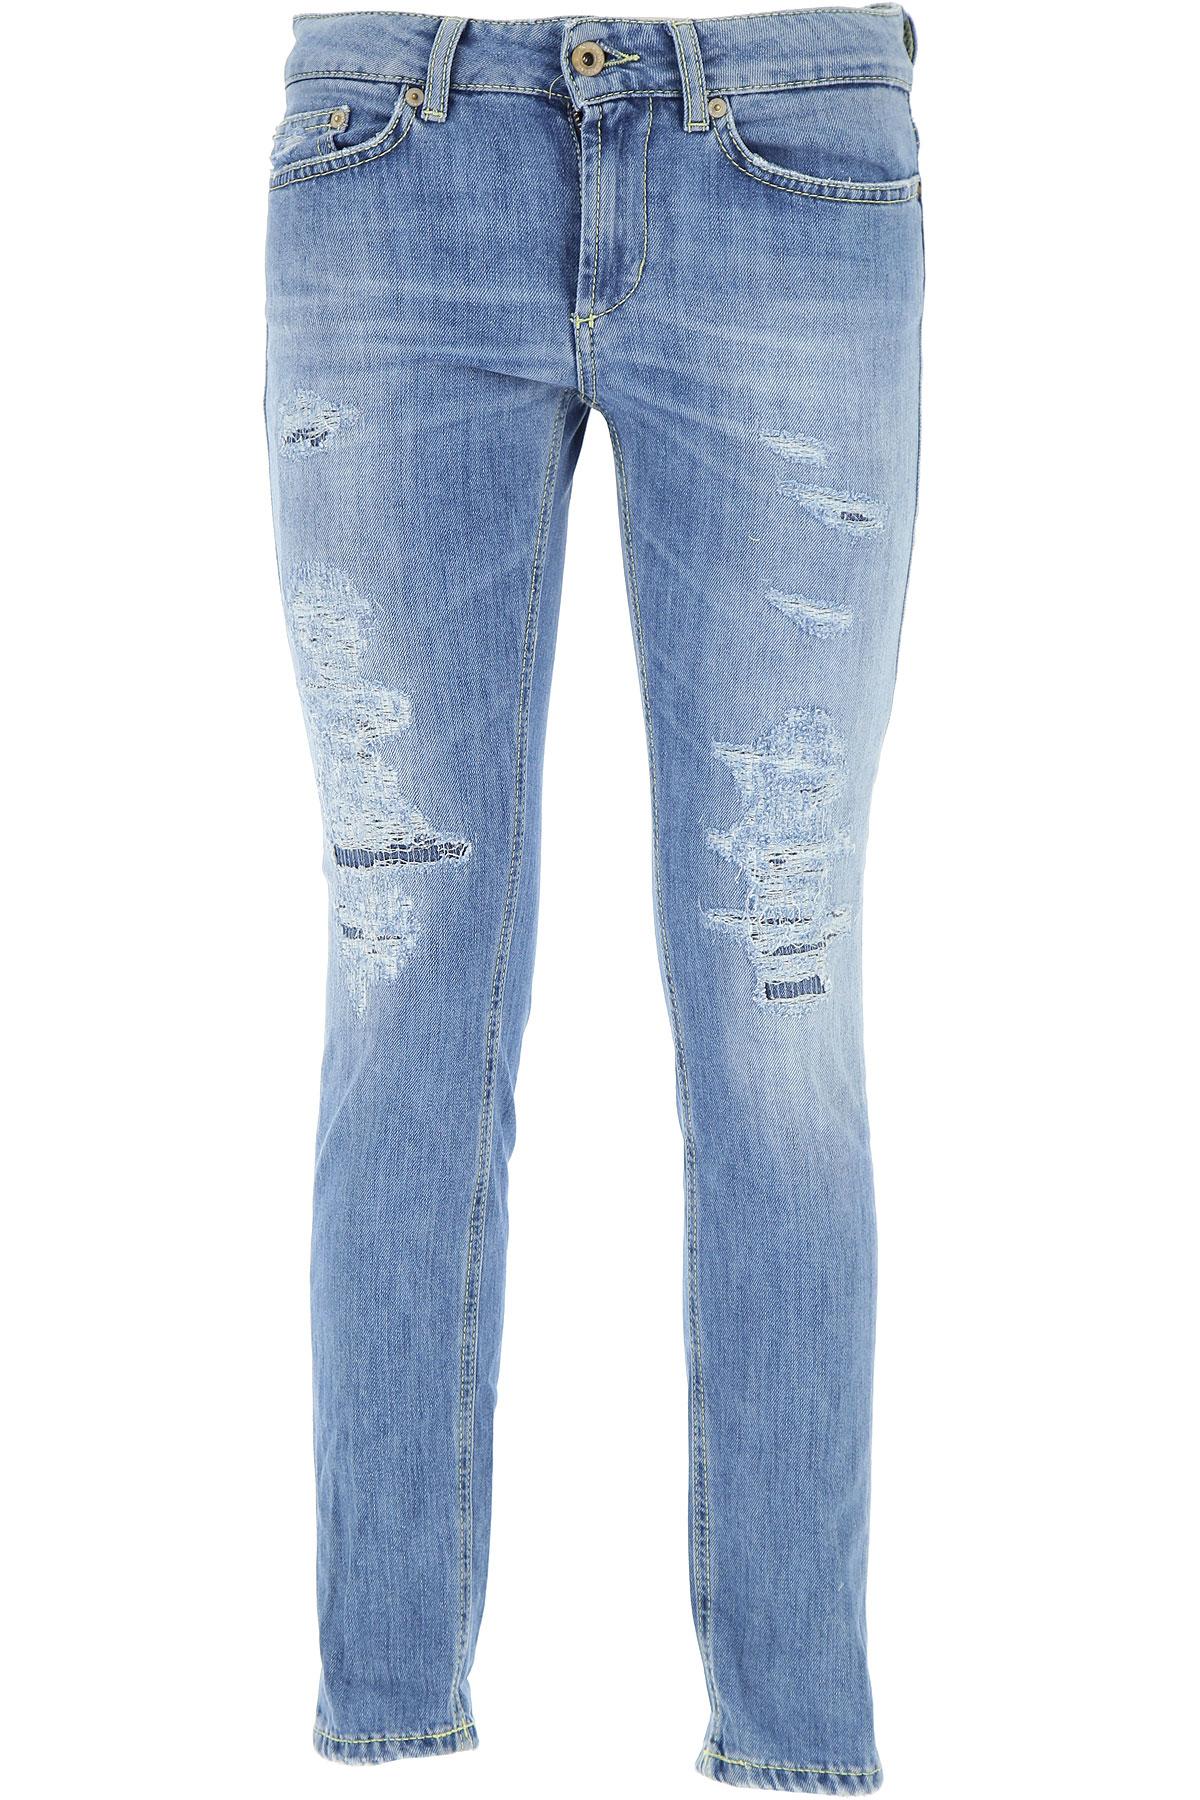 Dondup Jeans On Sale, Light Denim Blue, Cotton, 2017, 26 29